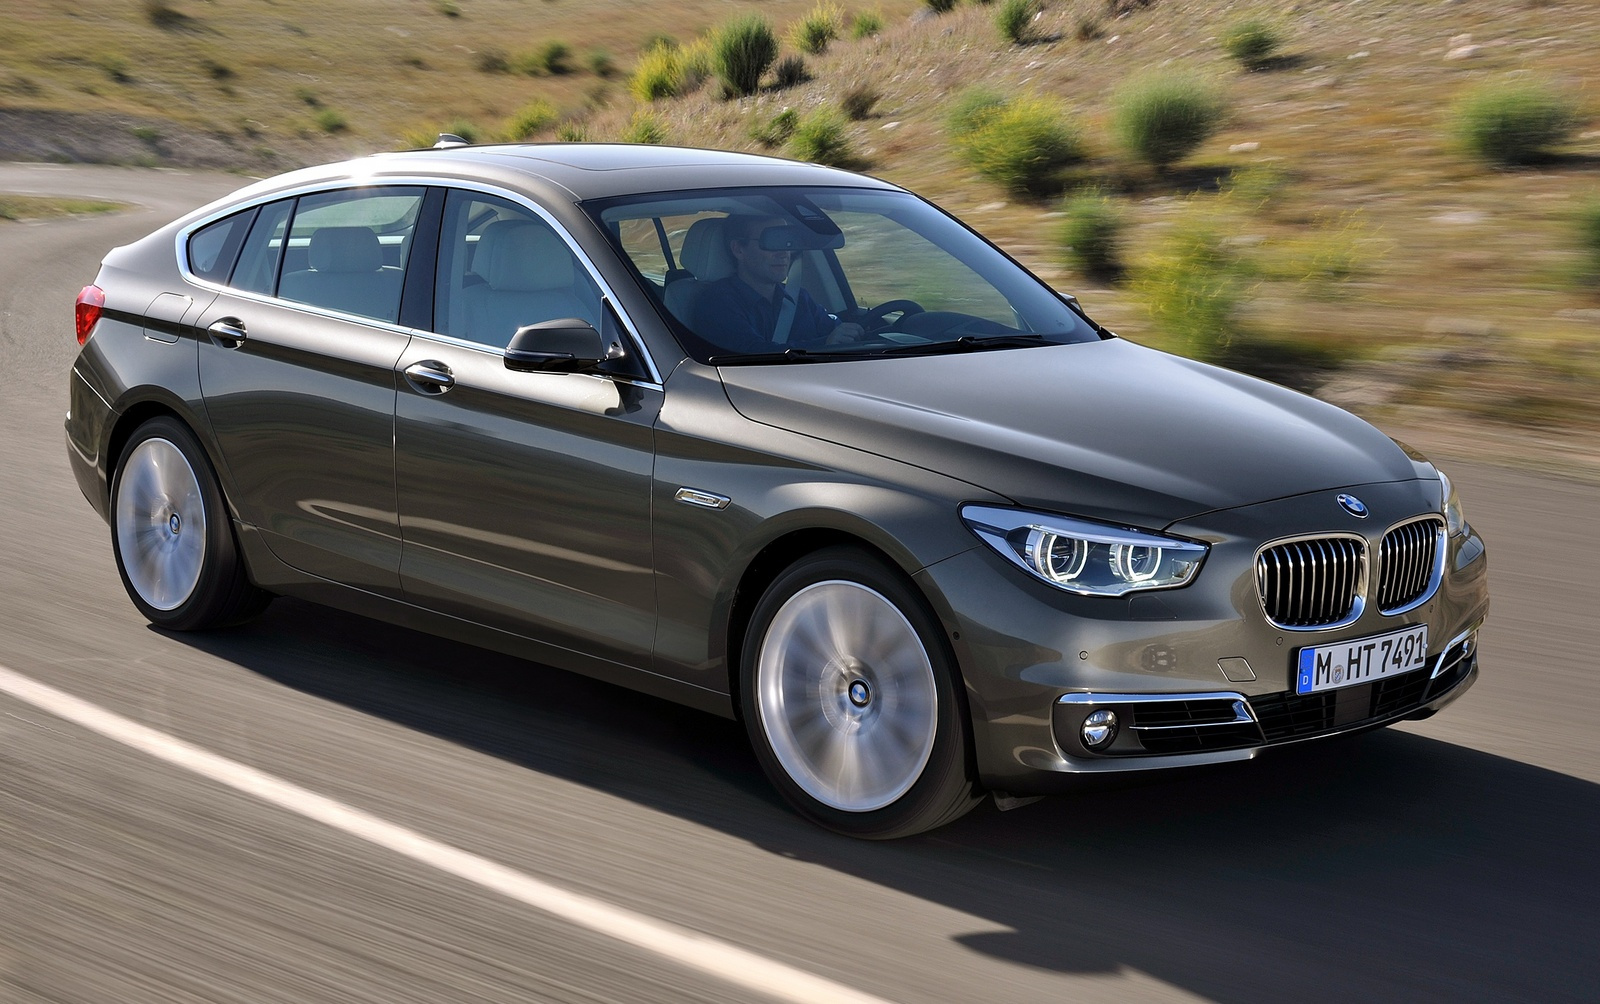 BMW Series Gran Turismo Overview CarGurus - 2014 bmw 535i price